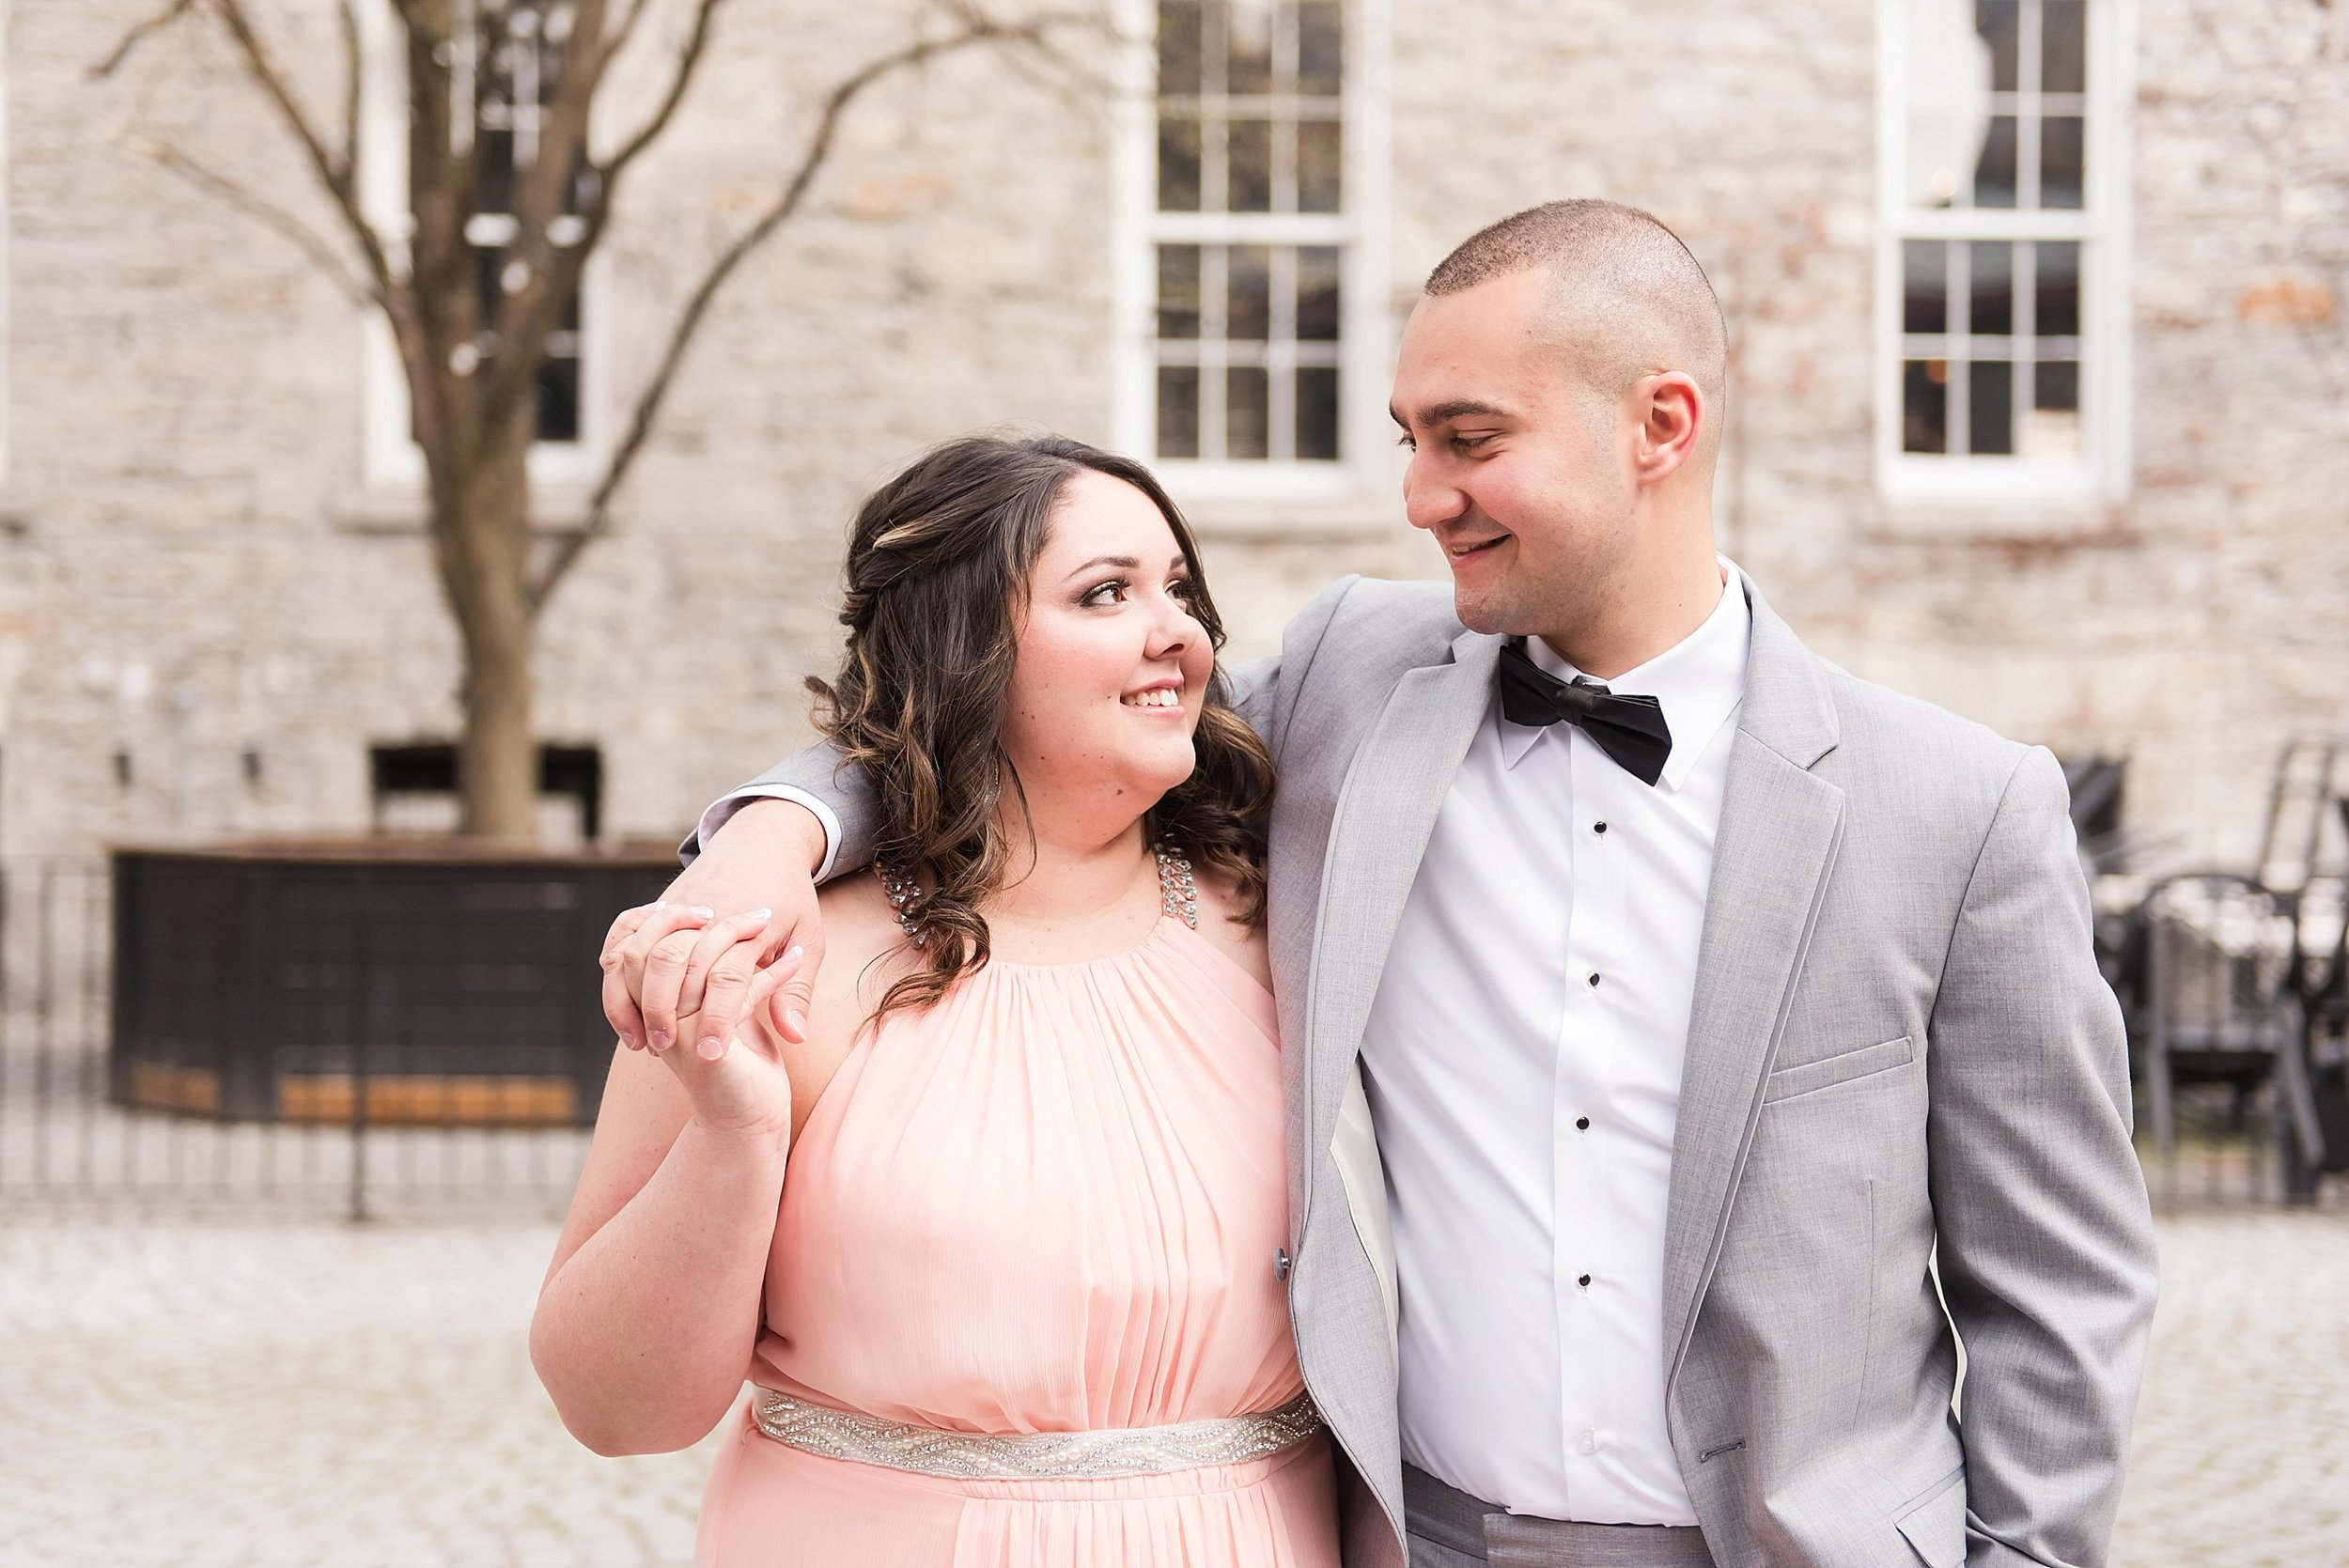 Sarmad Ashley Engagement Shoot- Ali Batoul Creatives Fine Art Wedding Photography_0061.jpg